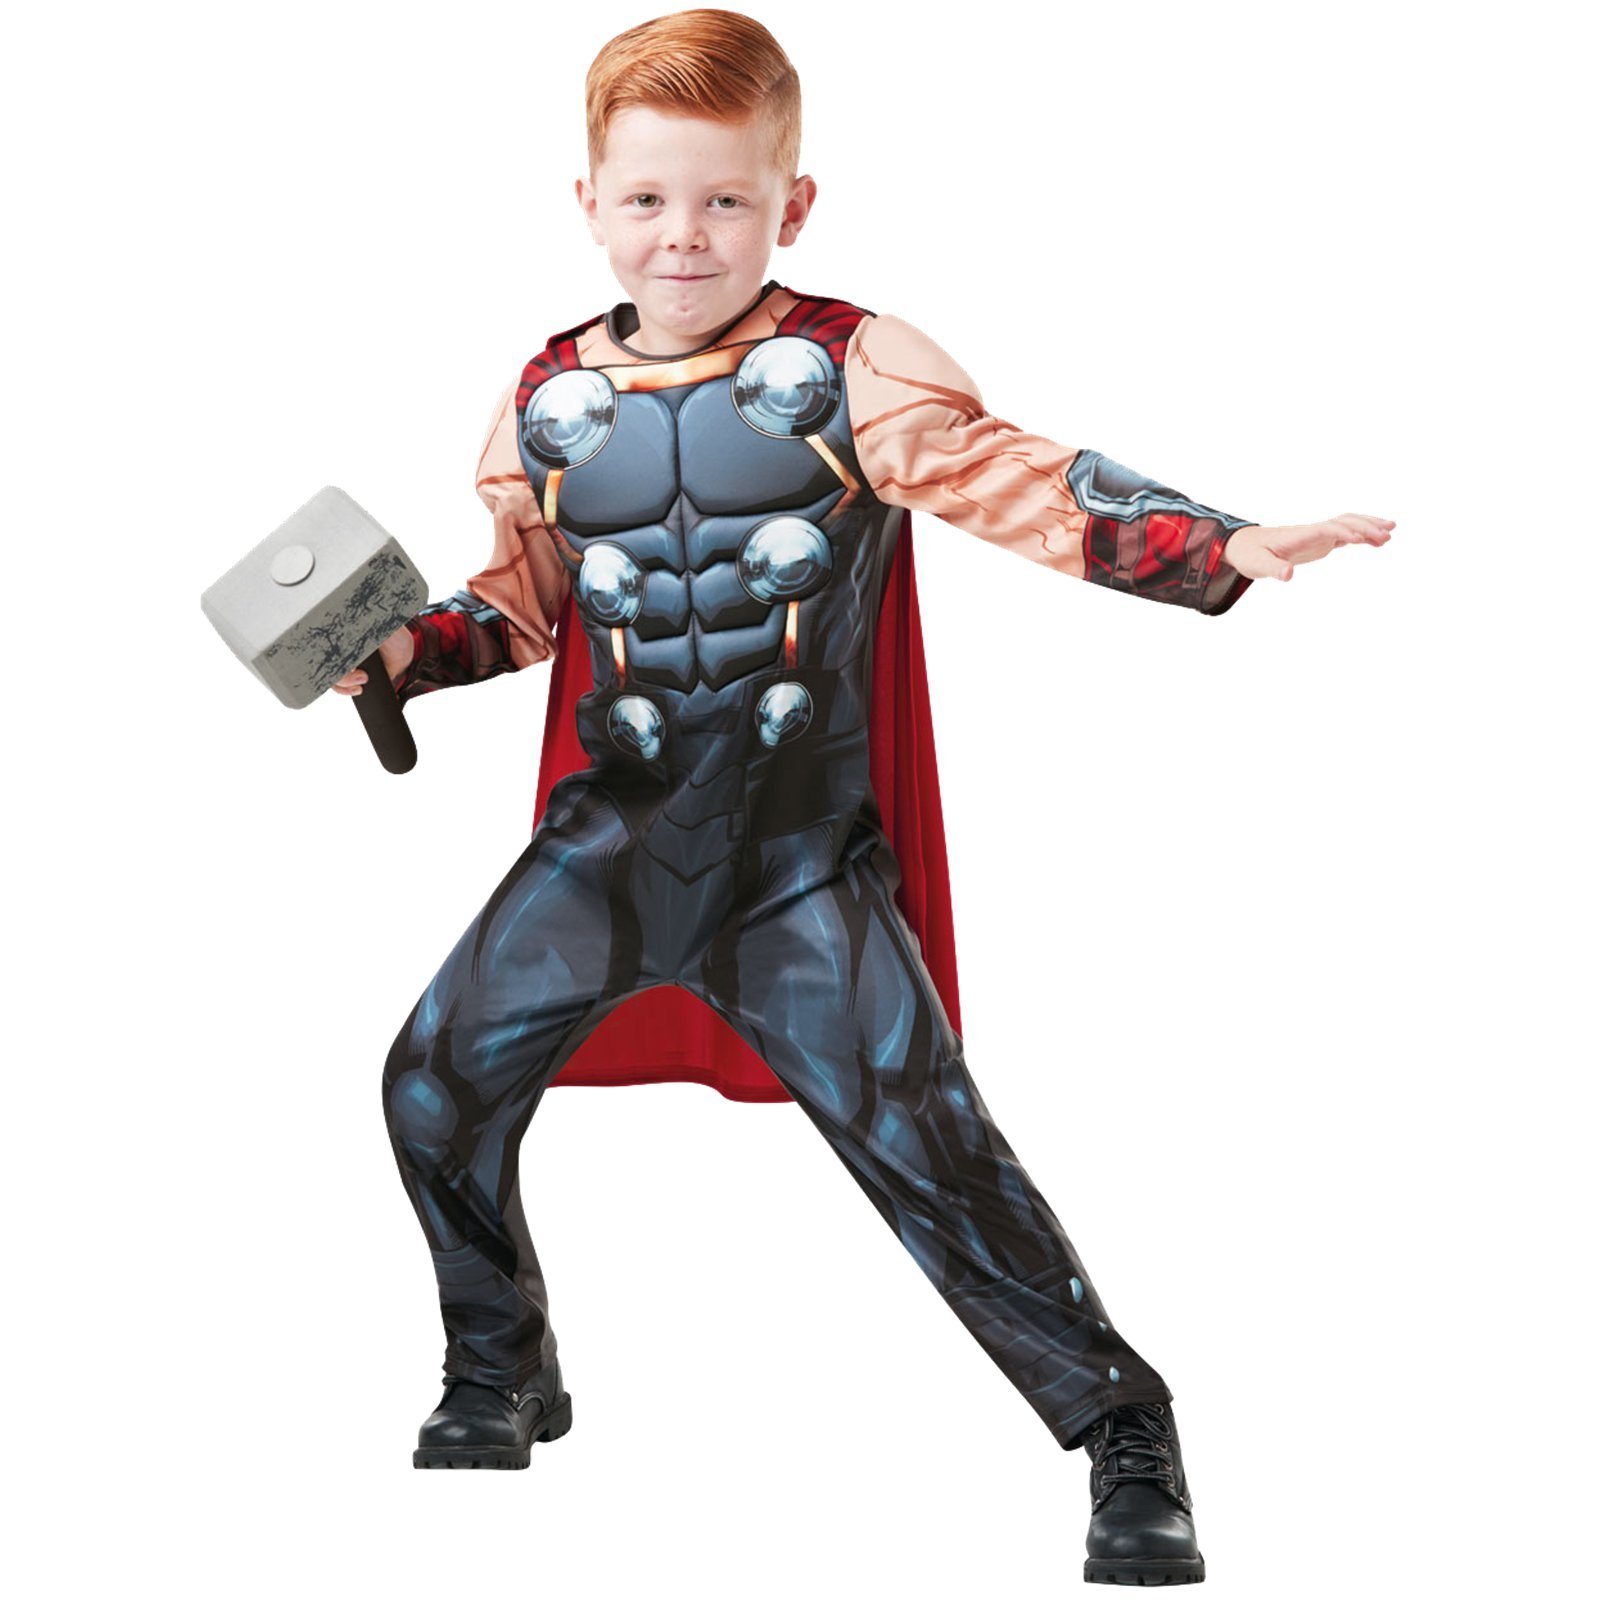 5b8cb99c1 Rubies 640836S Marvel Avengers Thor Deluxe - Disfraz infantil para niños,  talla pequeña - Disfraceslandia